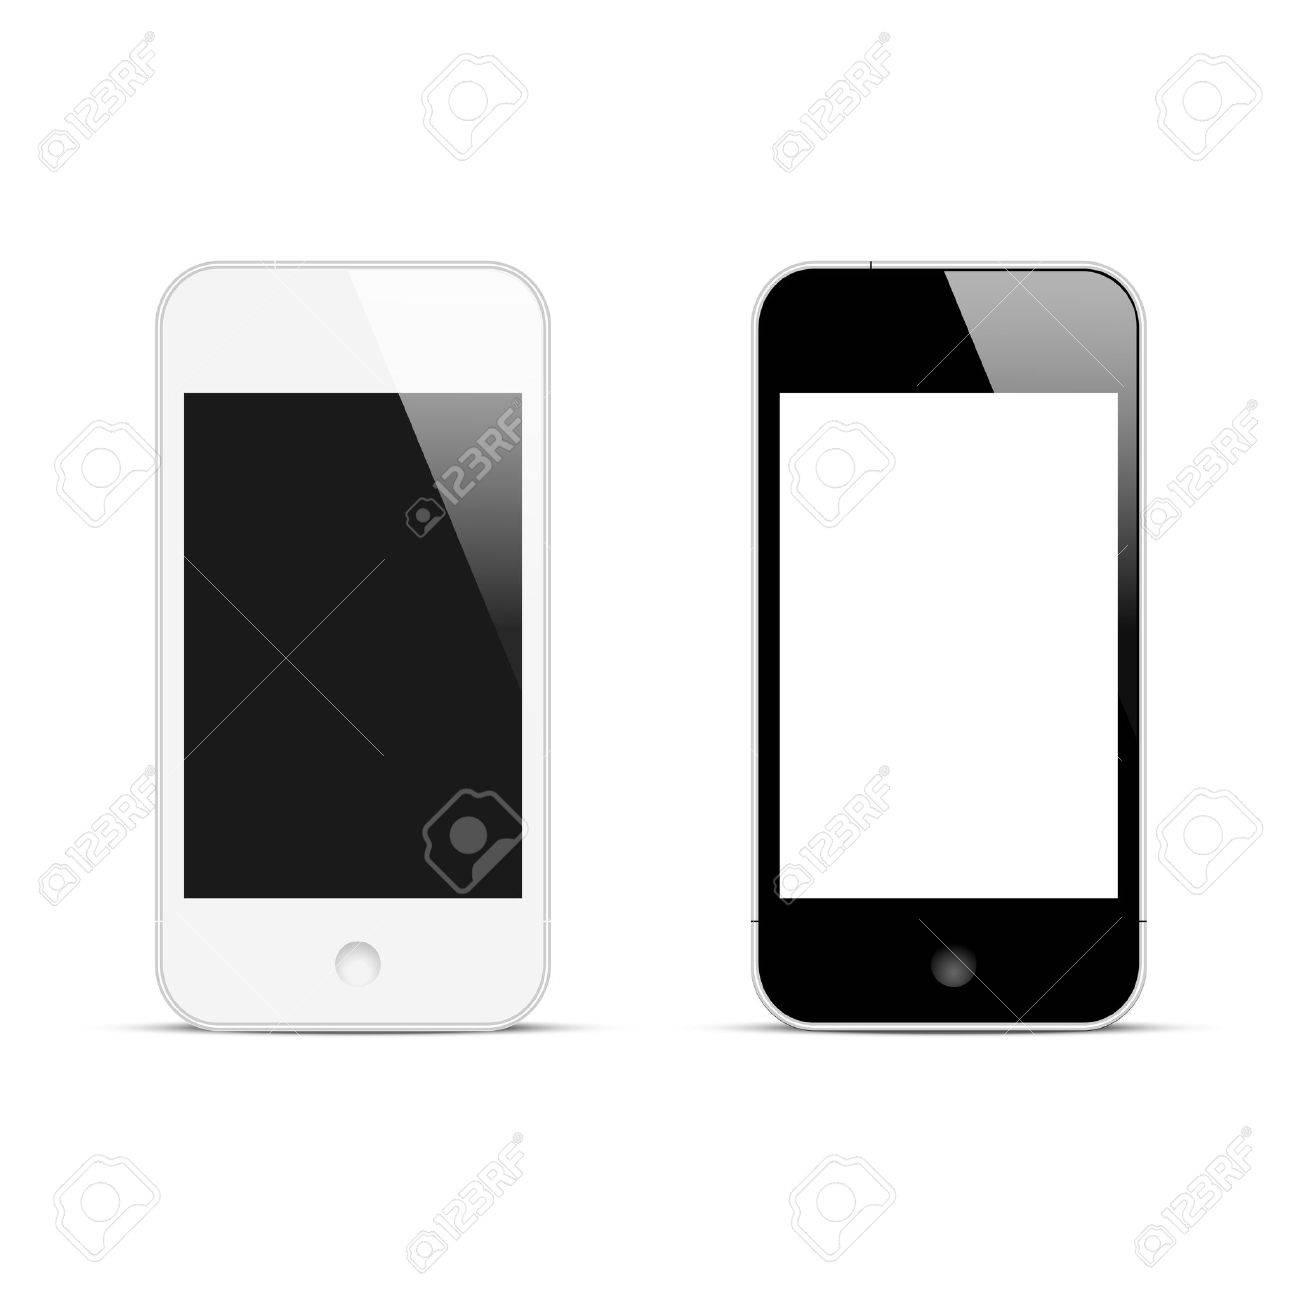 Modern smartphones with blank screen  Vector illustration Stock Vector - 22401859